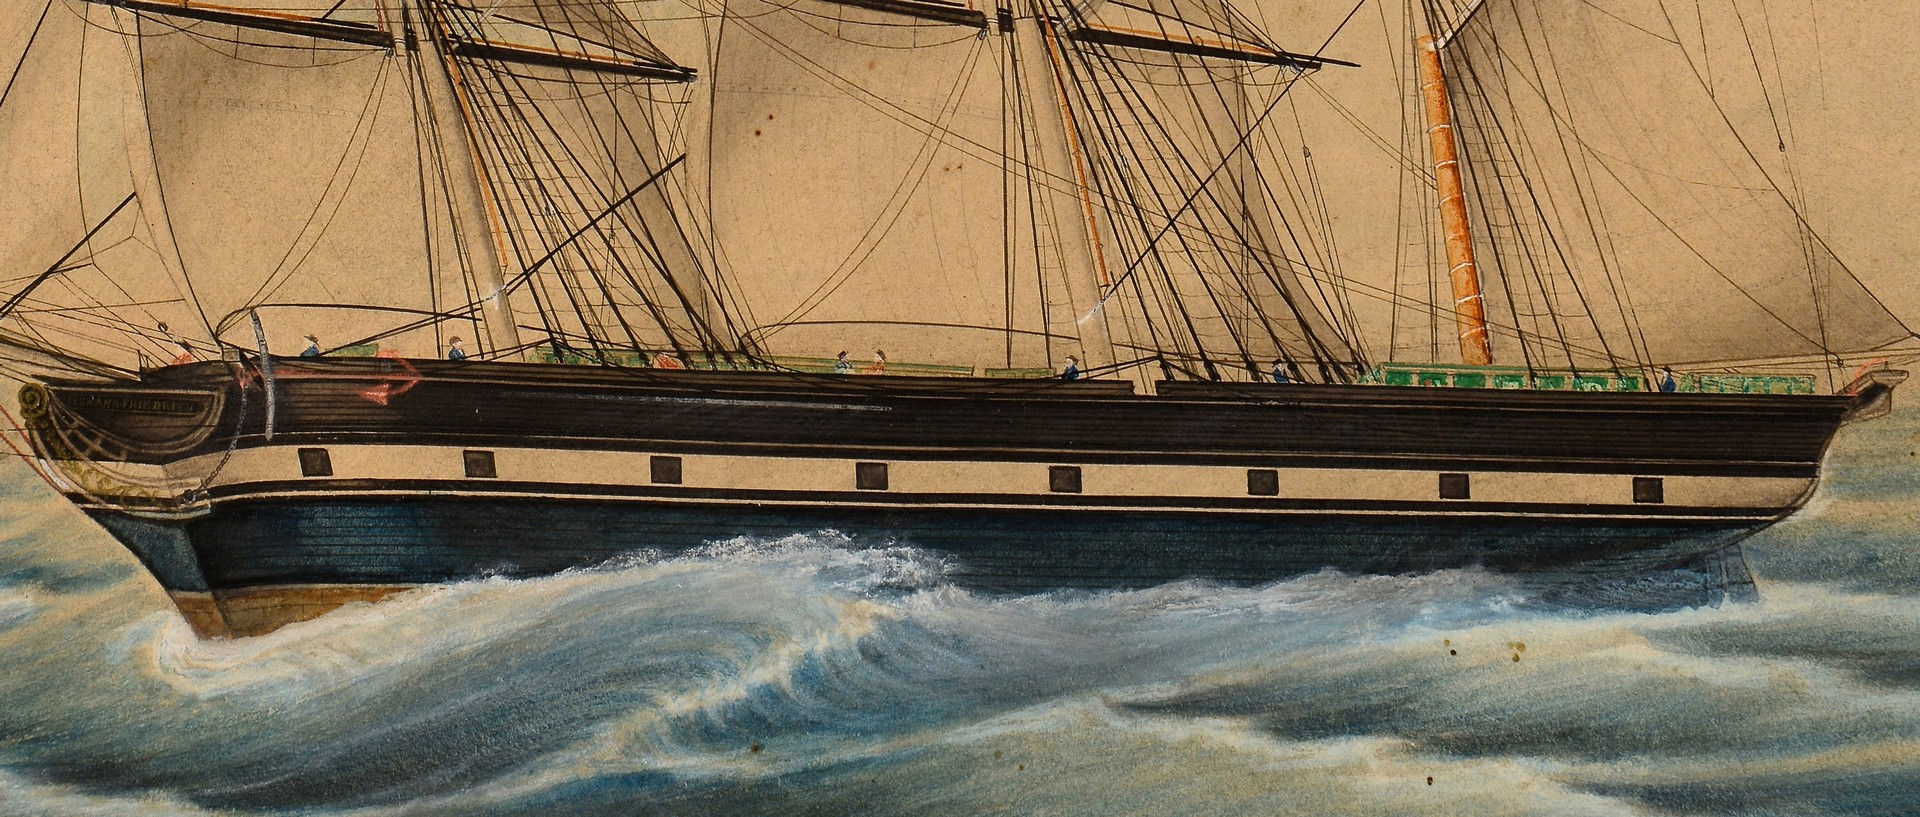 Lot 234: Ship watercolor, Lohann. Friedrich.